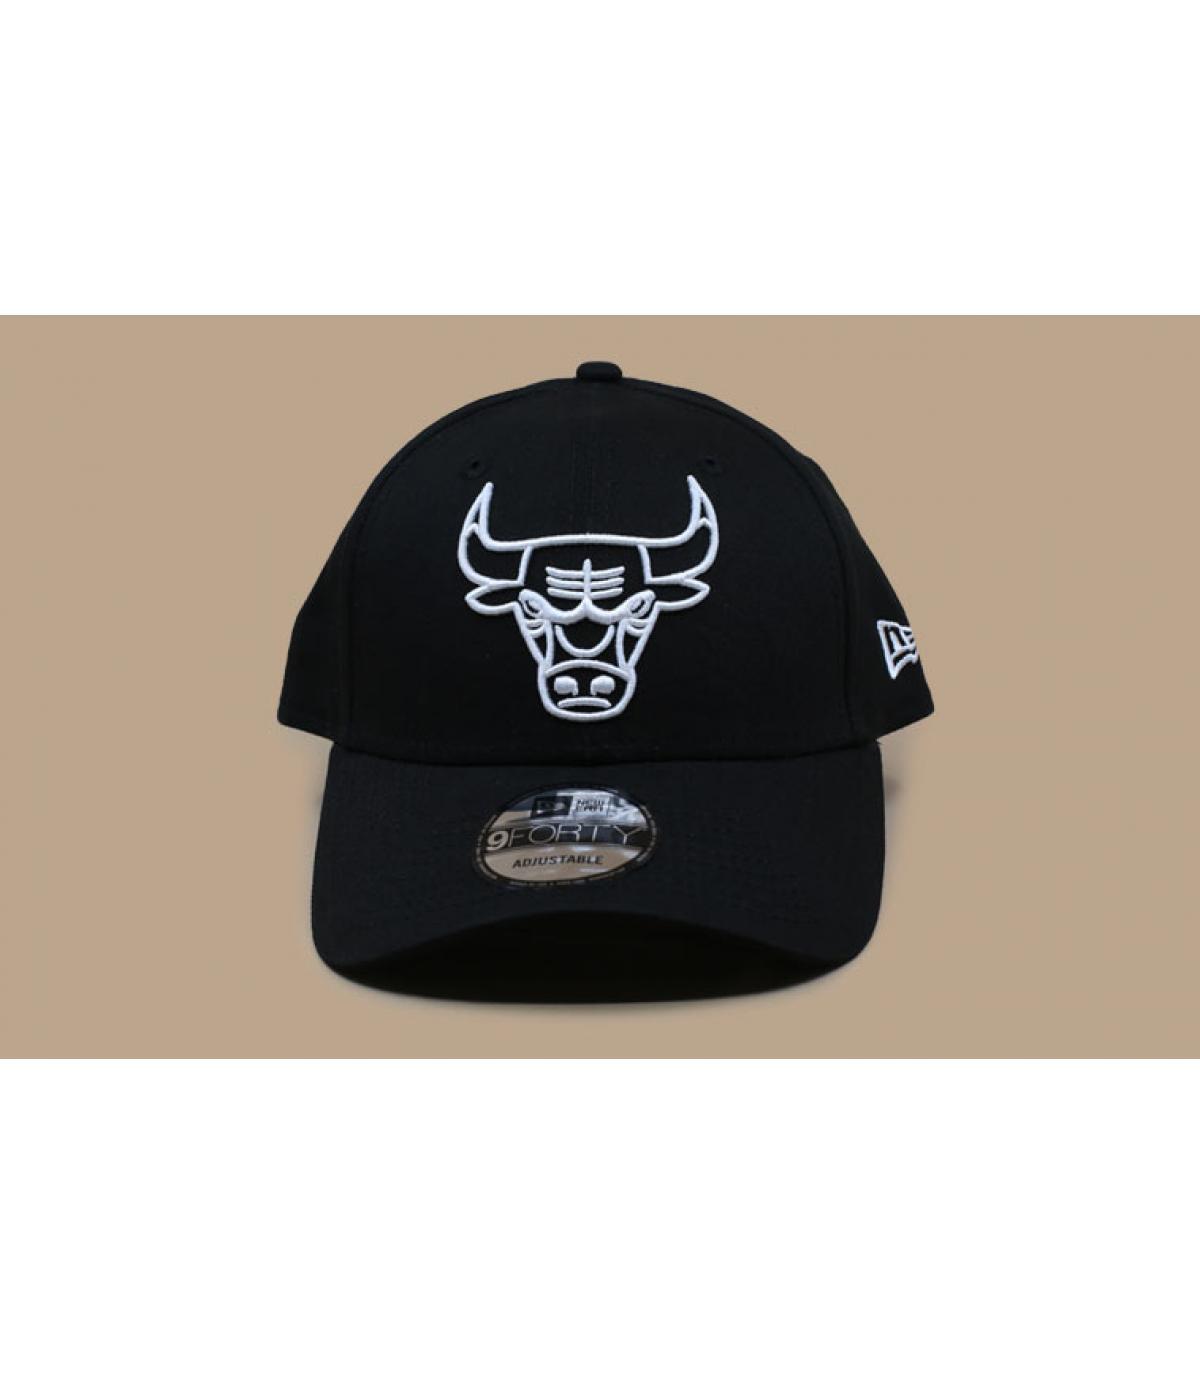 Detalles NBA League Ess 940 Bulls black white imagen 3